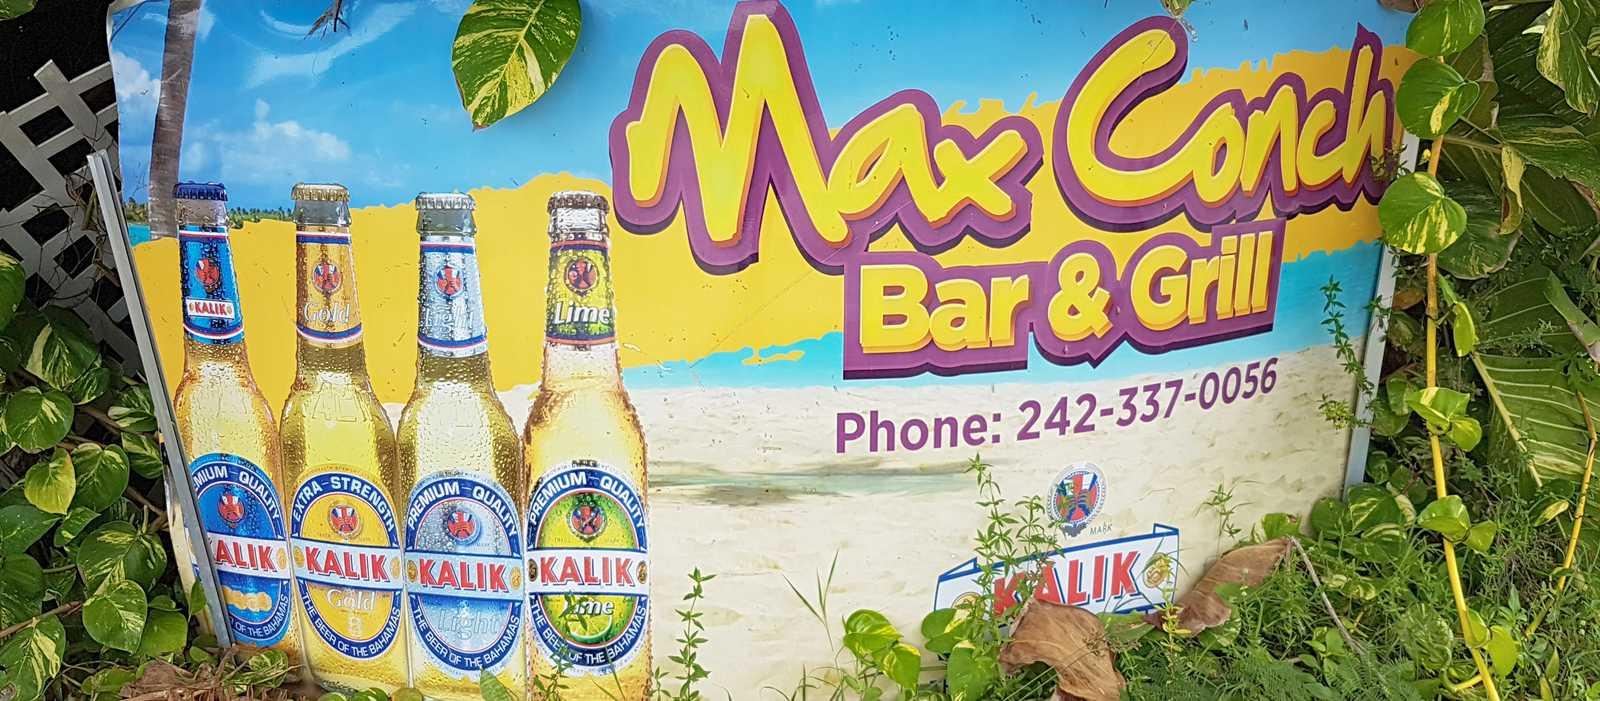 Max Conch Bar